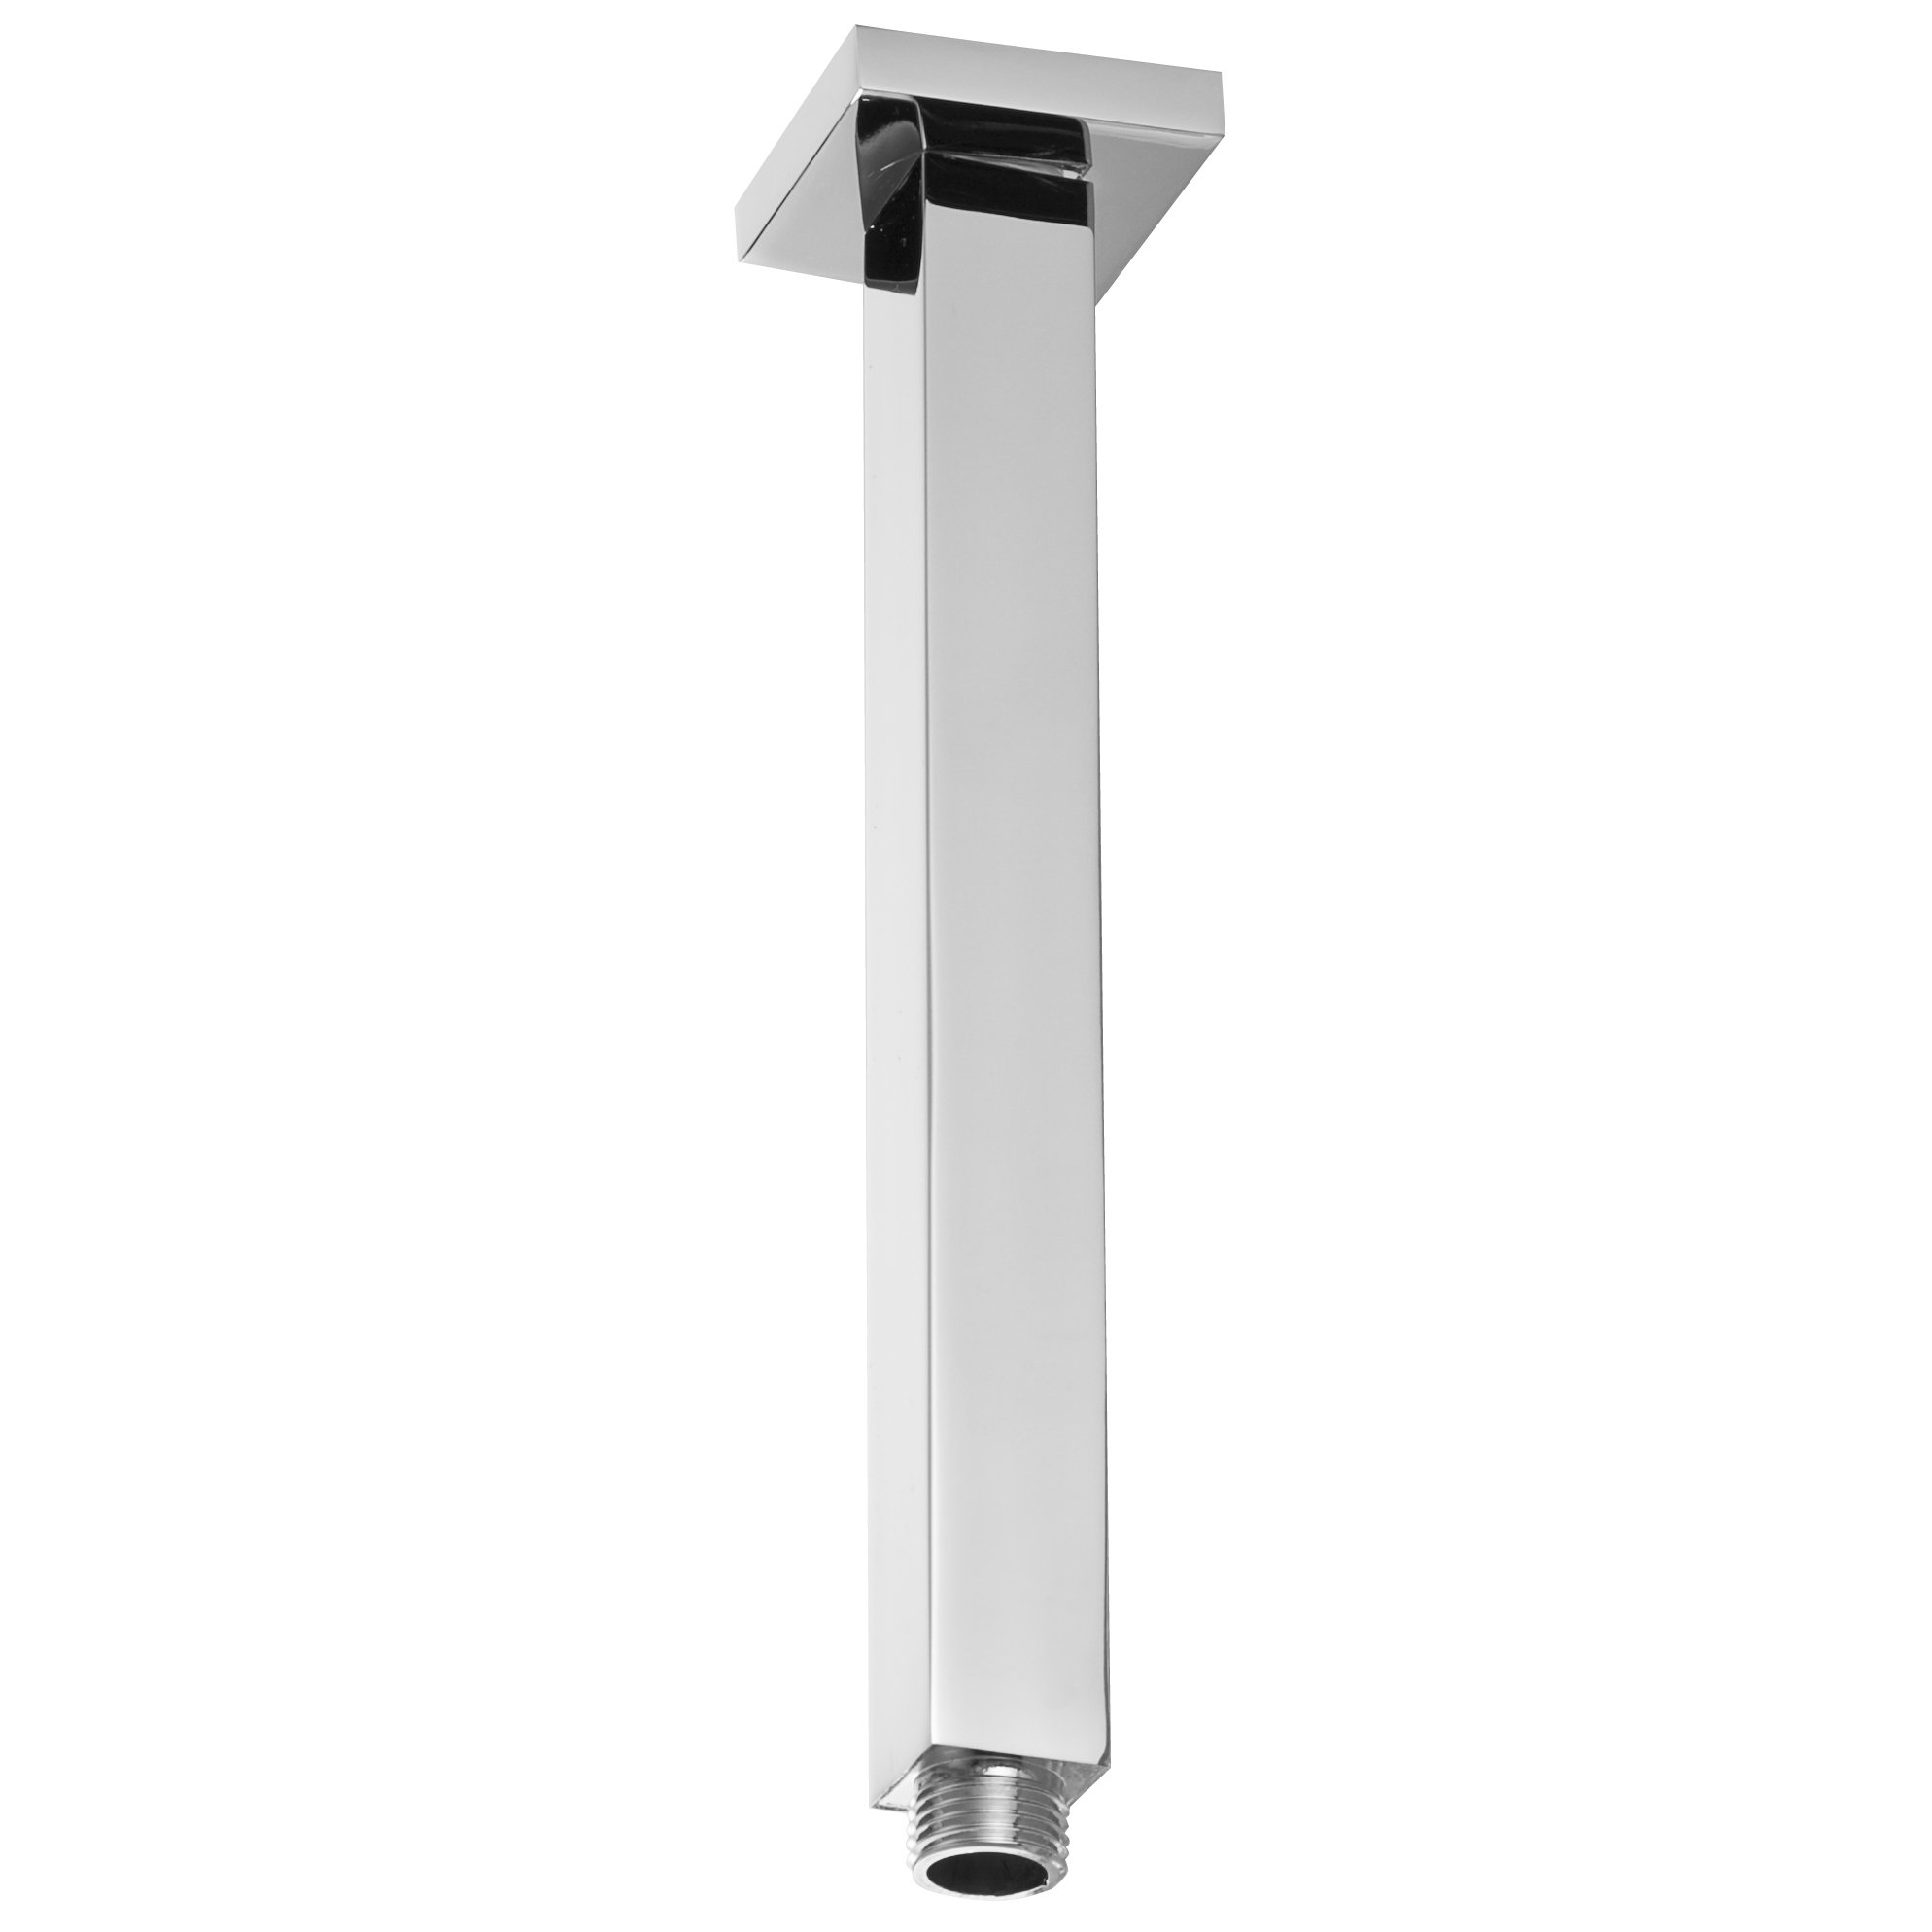 Westbrass D3609S-26 Square Ceiling Drop Shower Arm & Flange, Polished Chrome